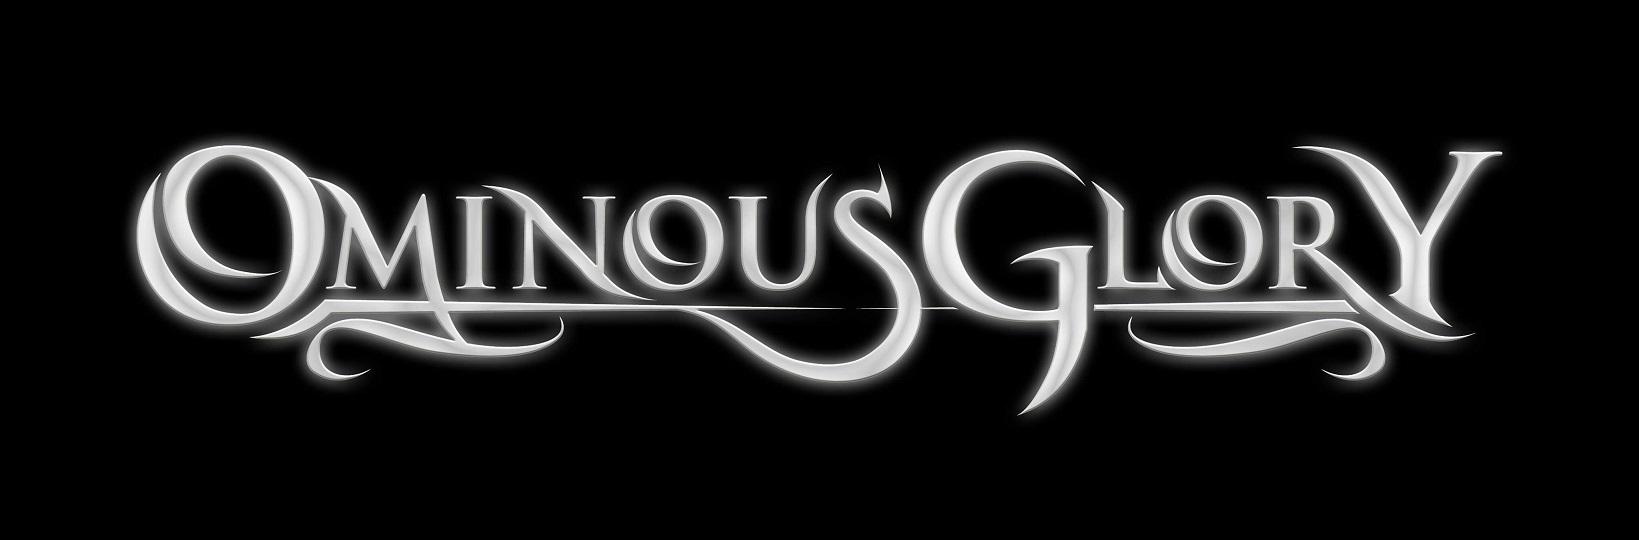 Ominous Glory - Logo